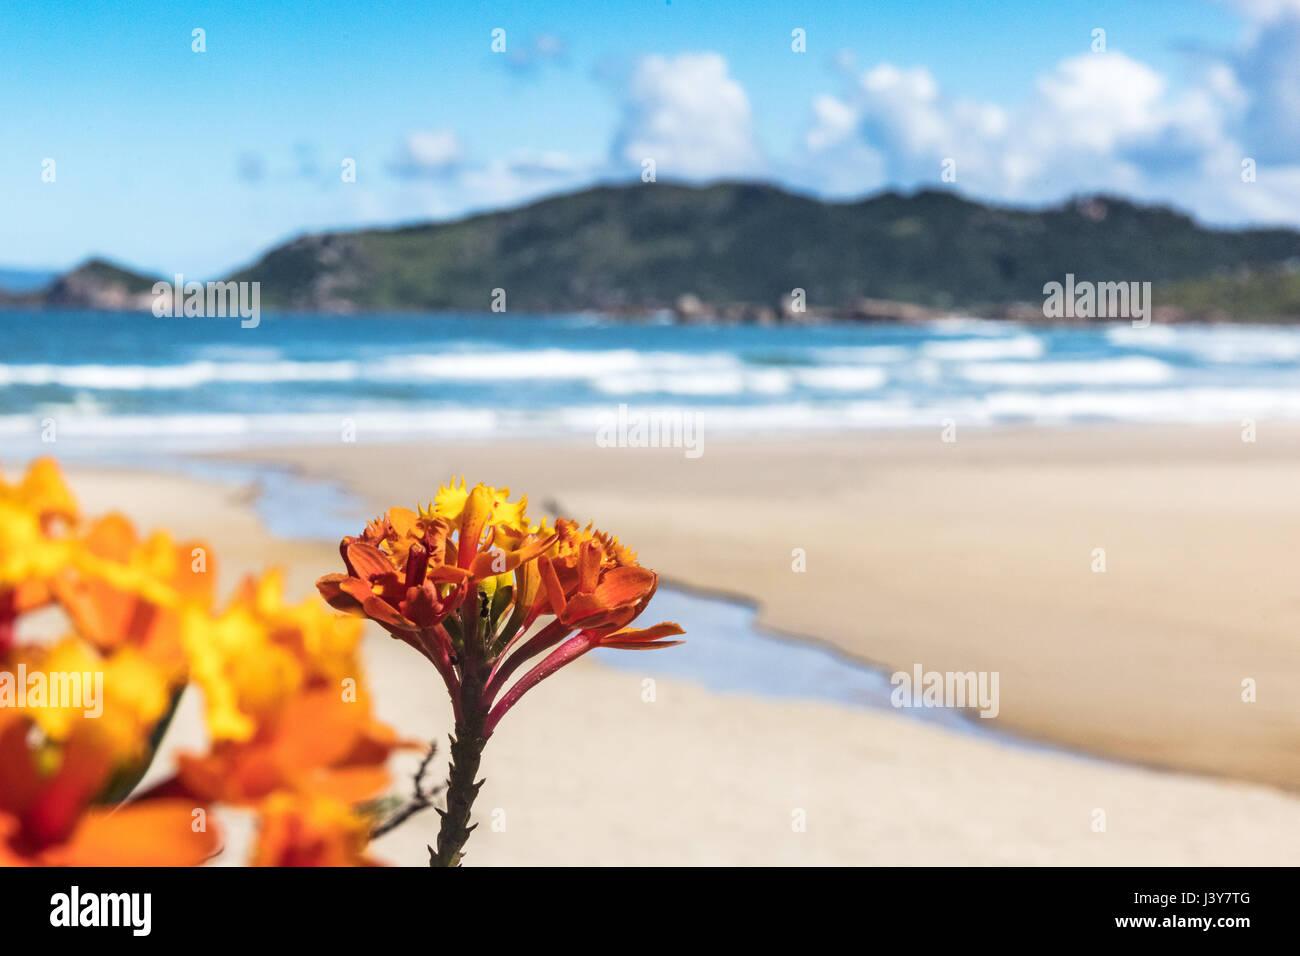 Close up of orange flowers by beach, Florianopolis, Santa Catarina, Brazil - Stock Image